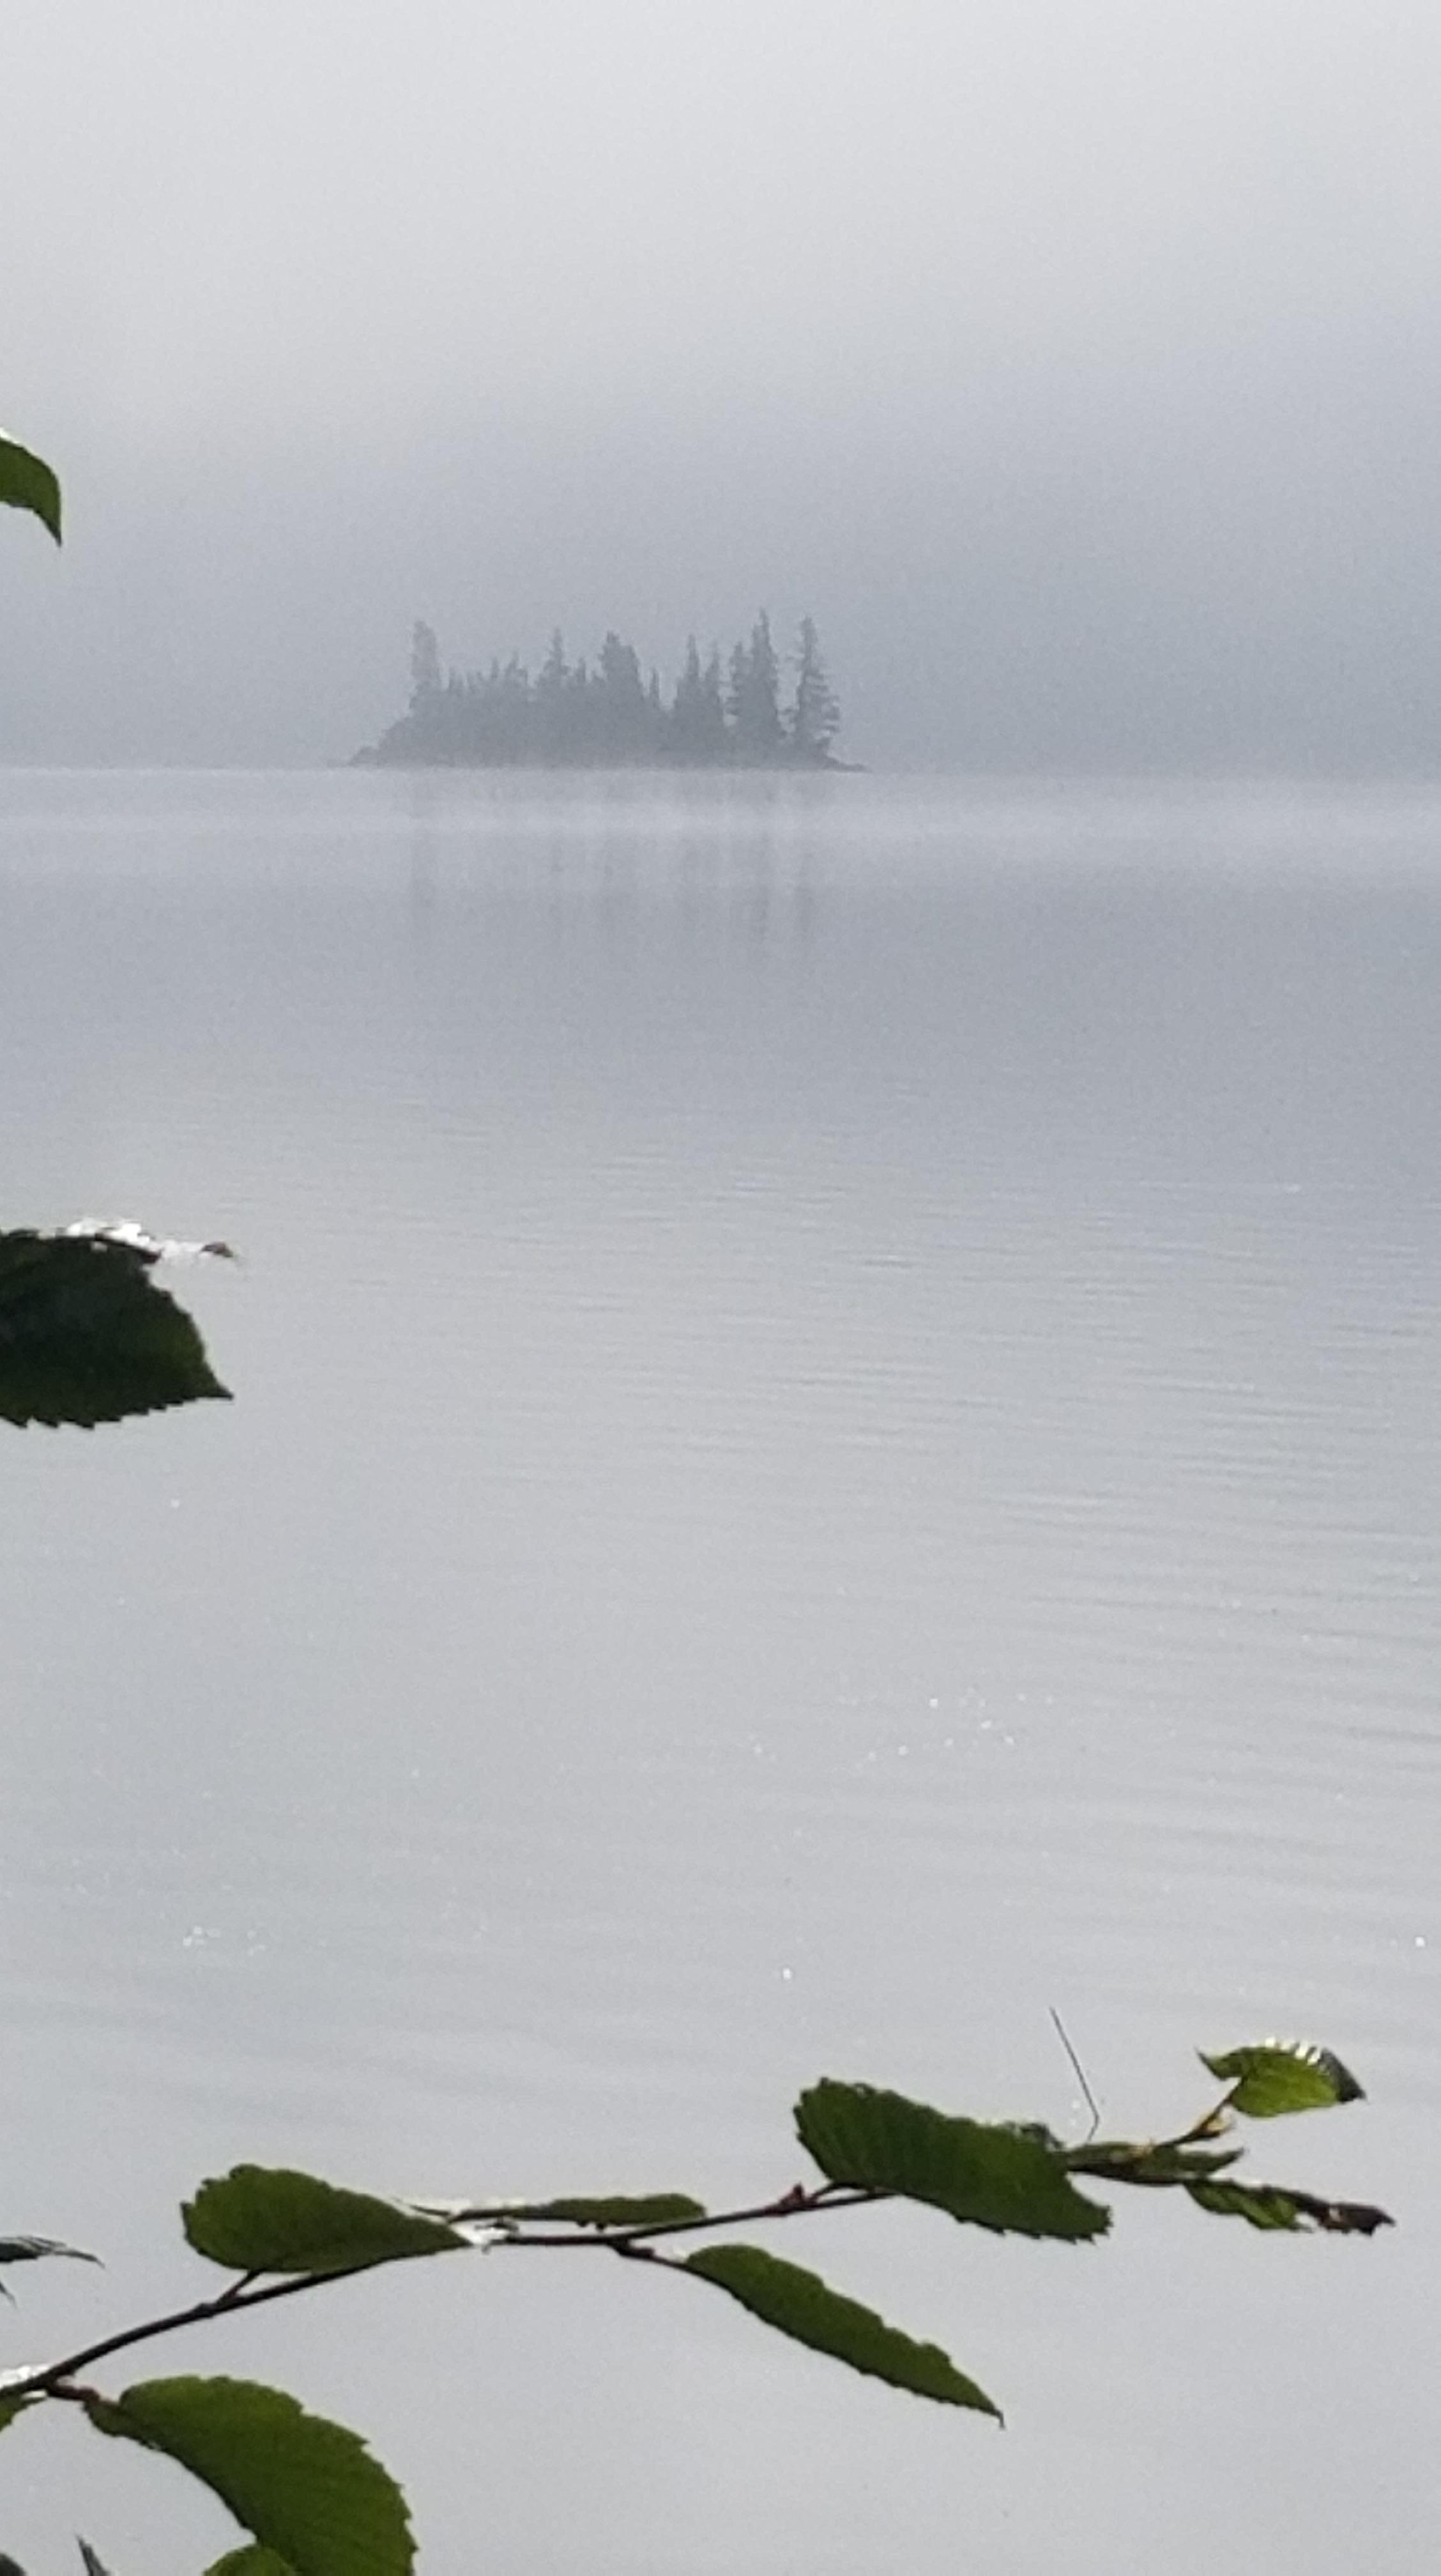 jessica calm leaves island sun fog